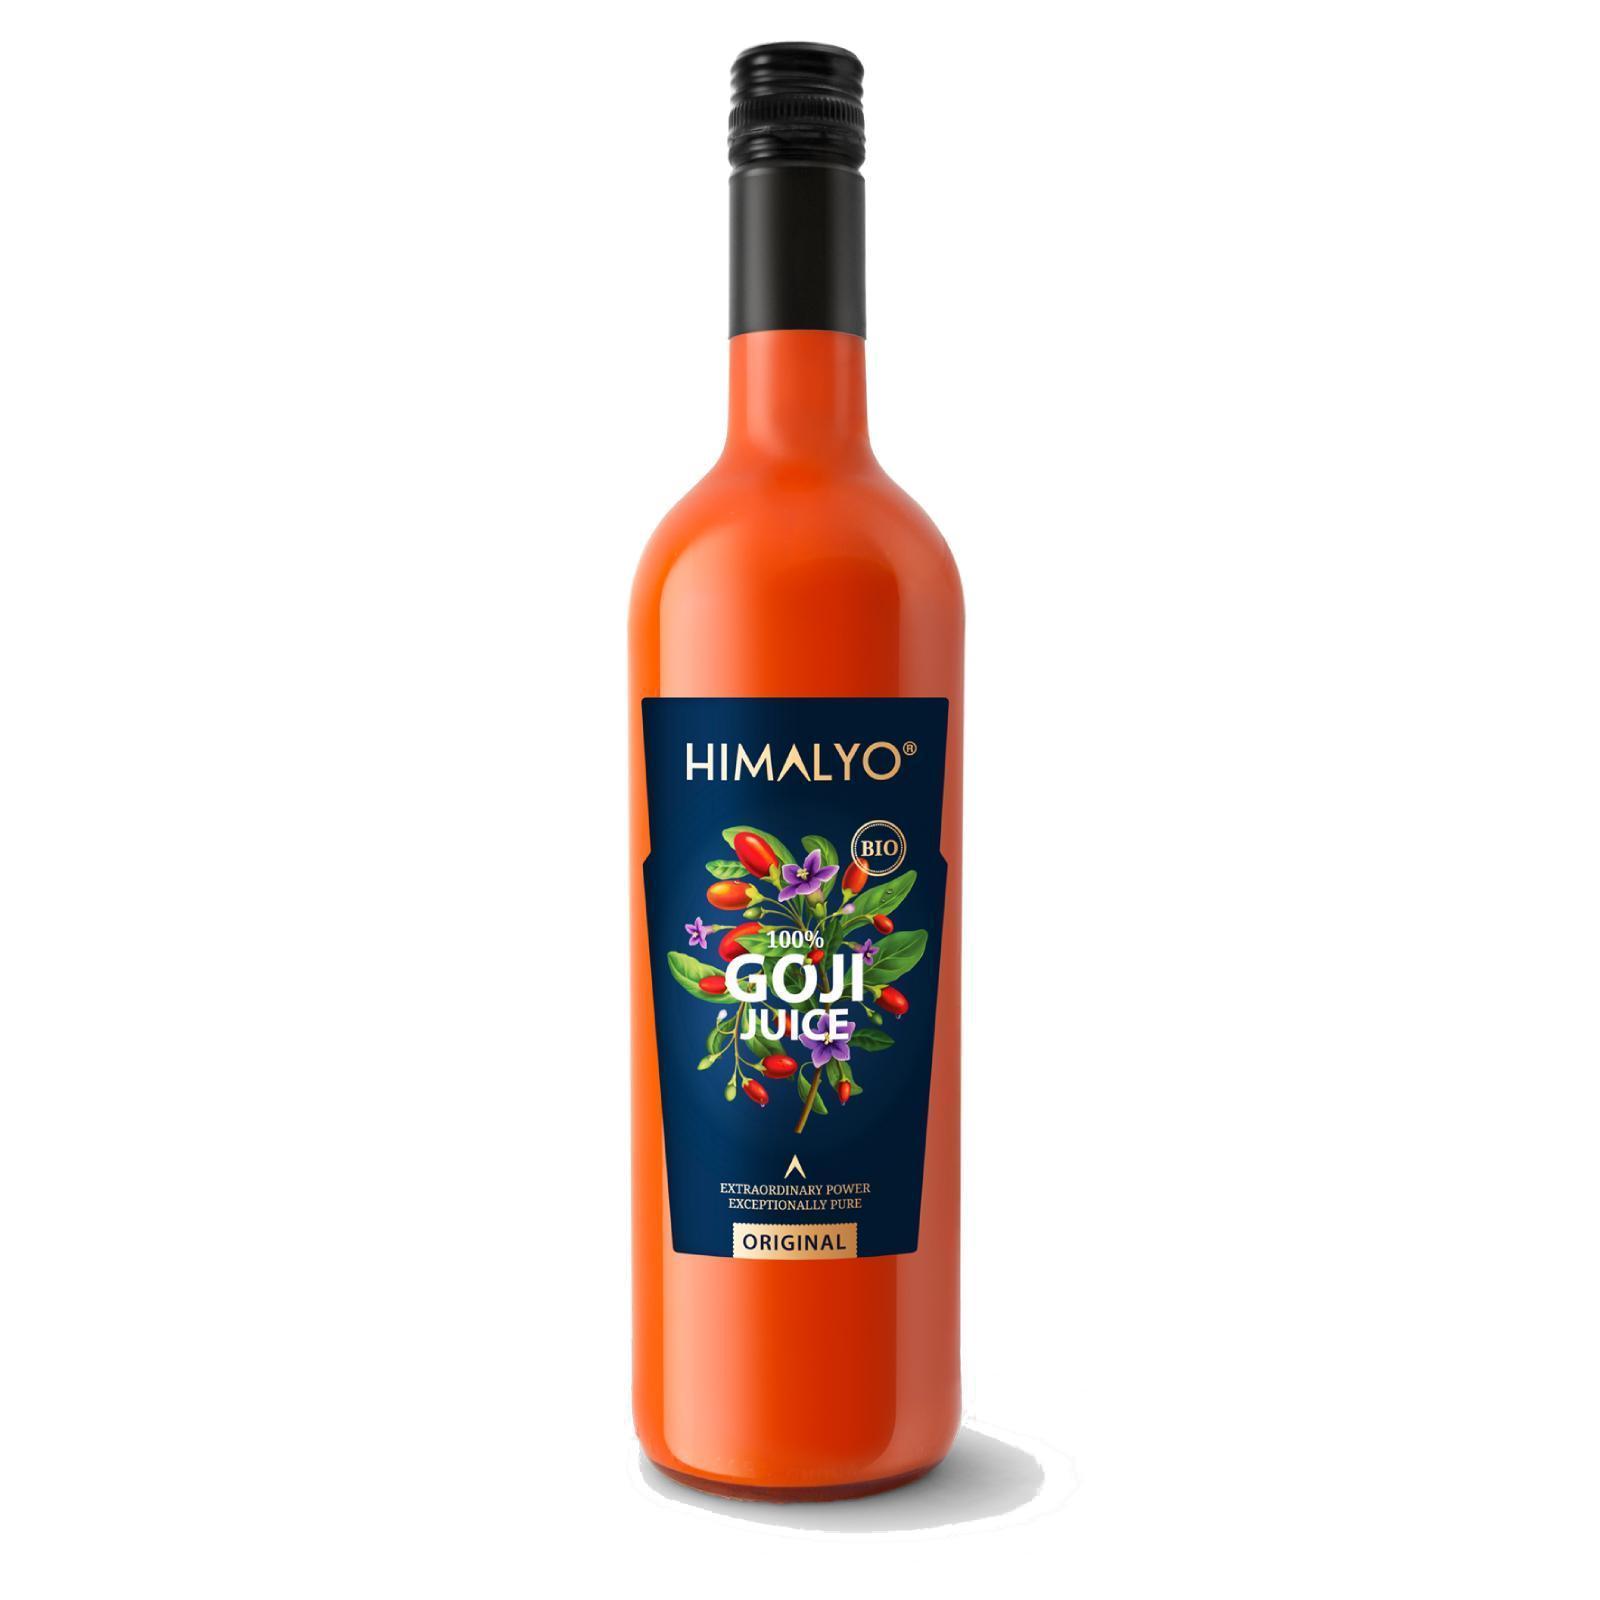 Himalyo 100% Goji šťáva, BIO 350 ml